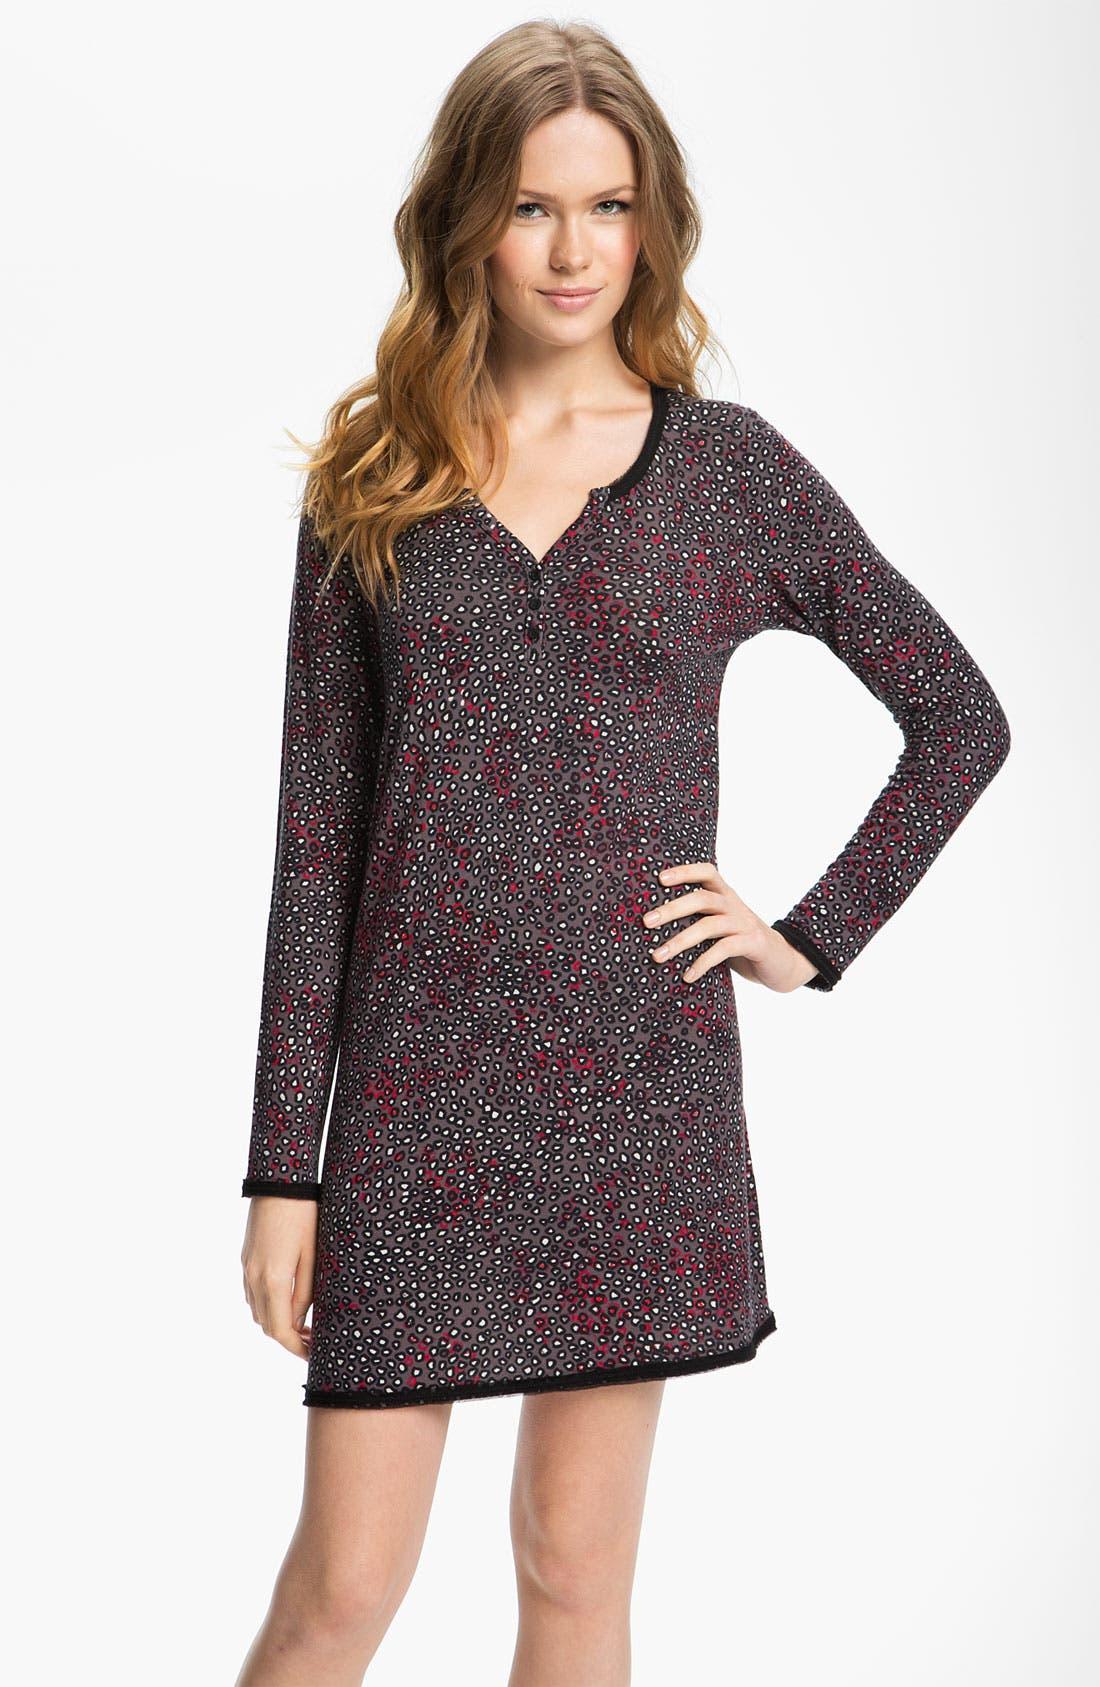 Alternate Image 1 Selected - DKNY 'Sheer Bliss' Sleep Shirt